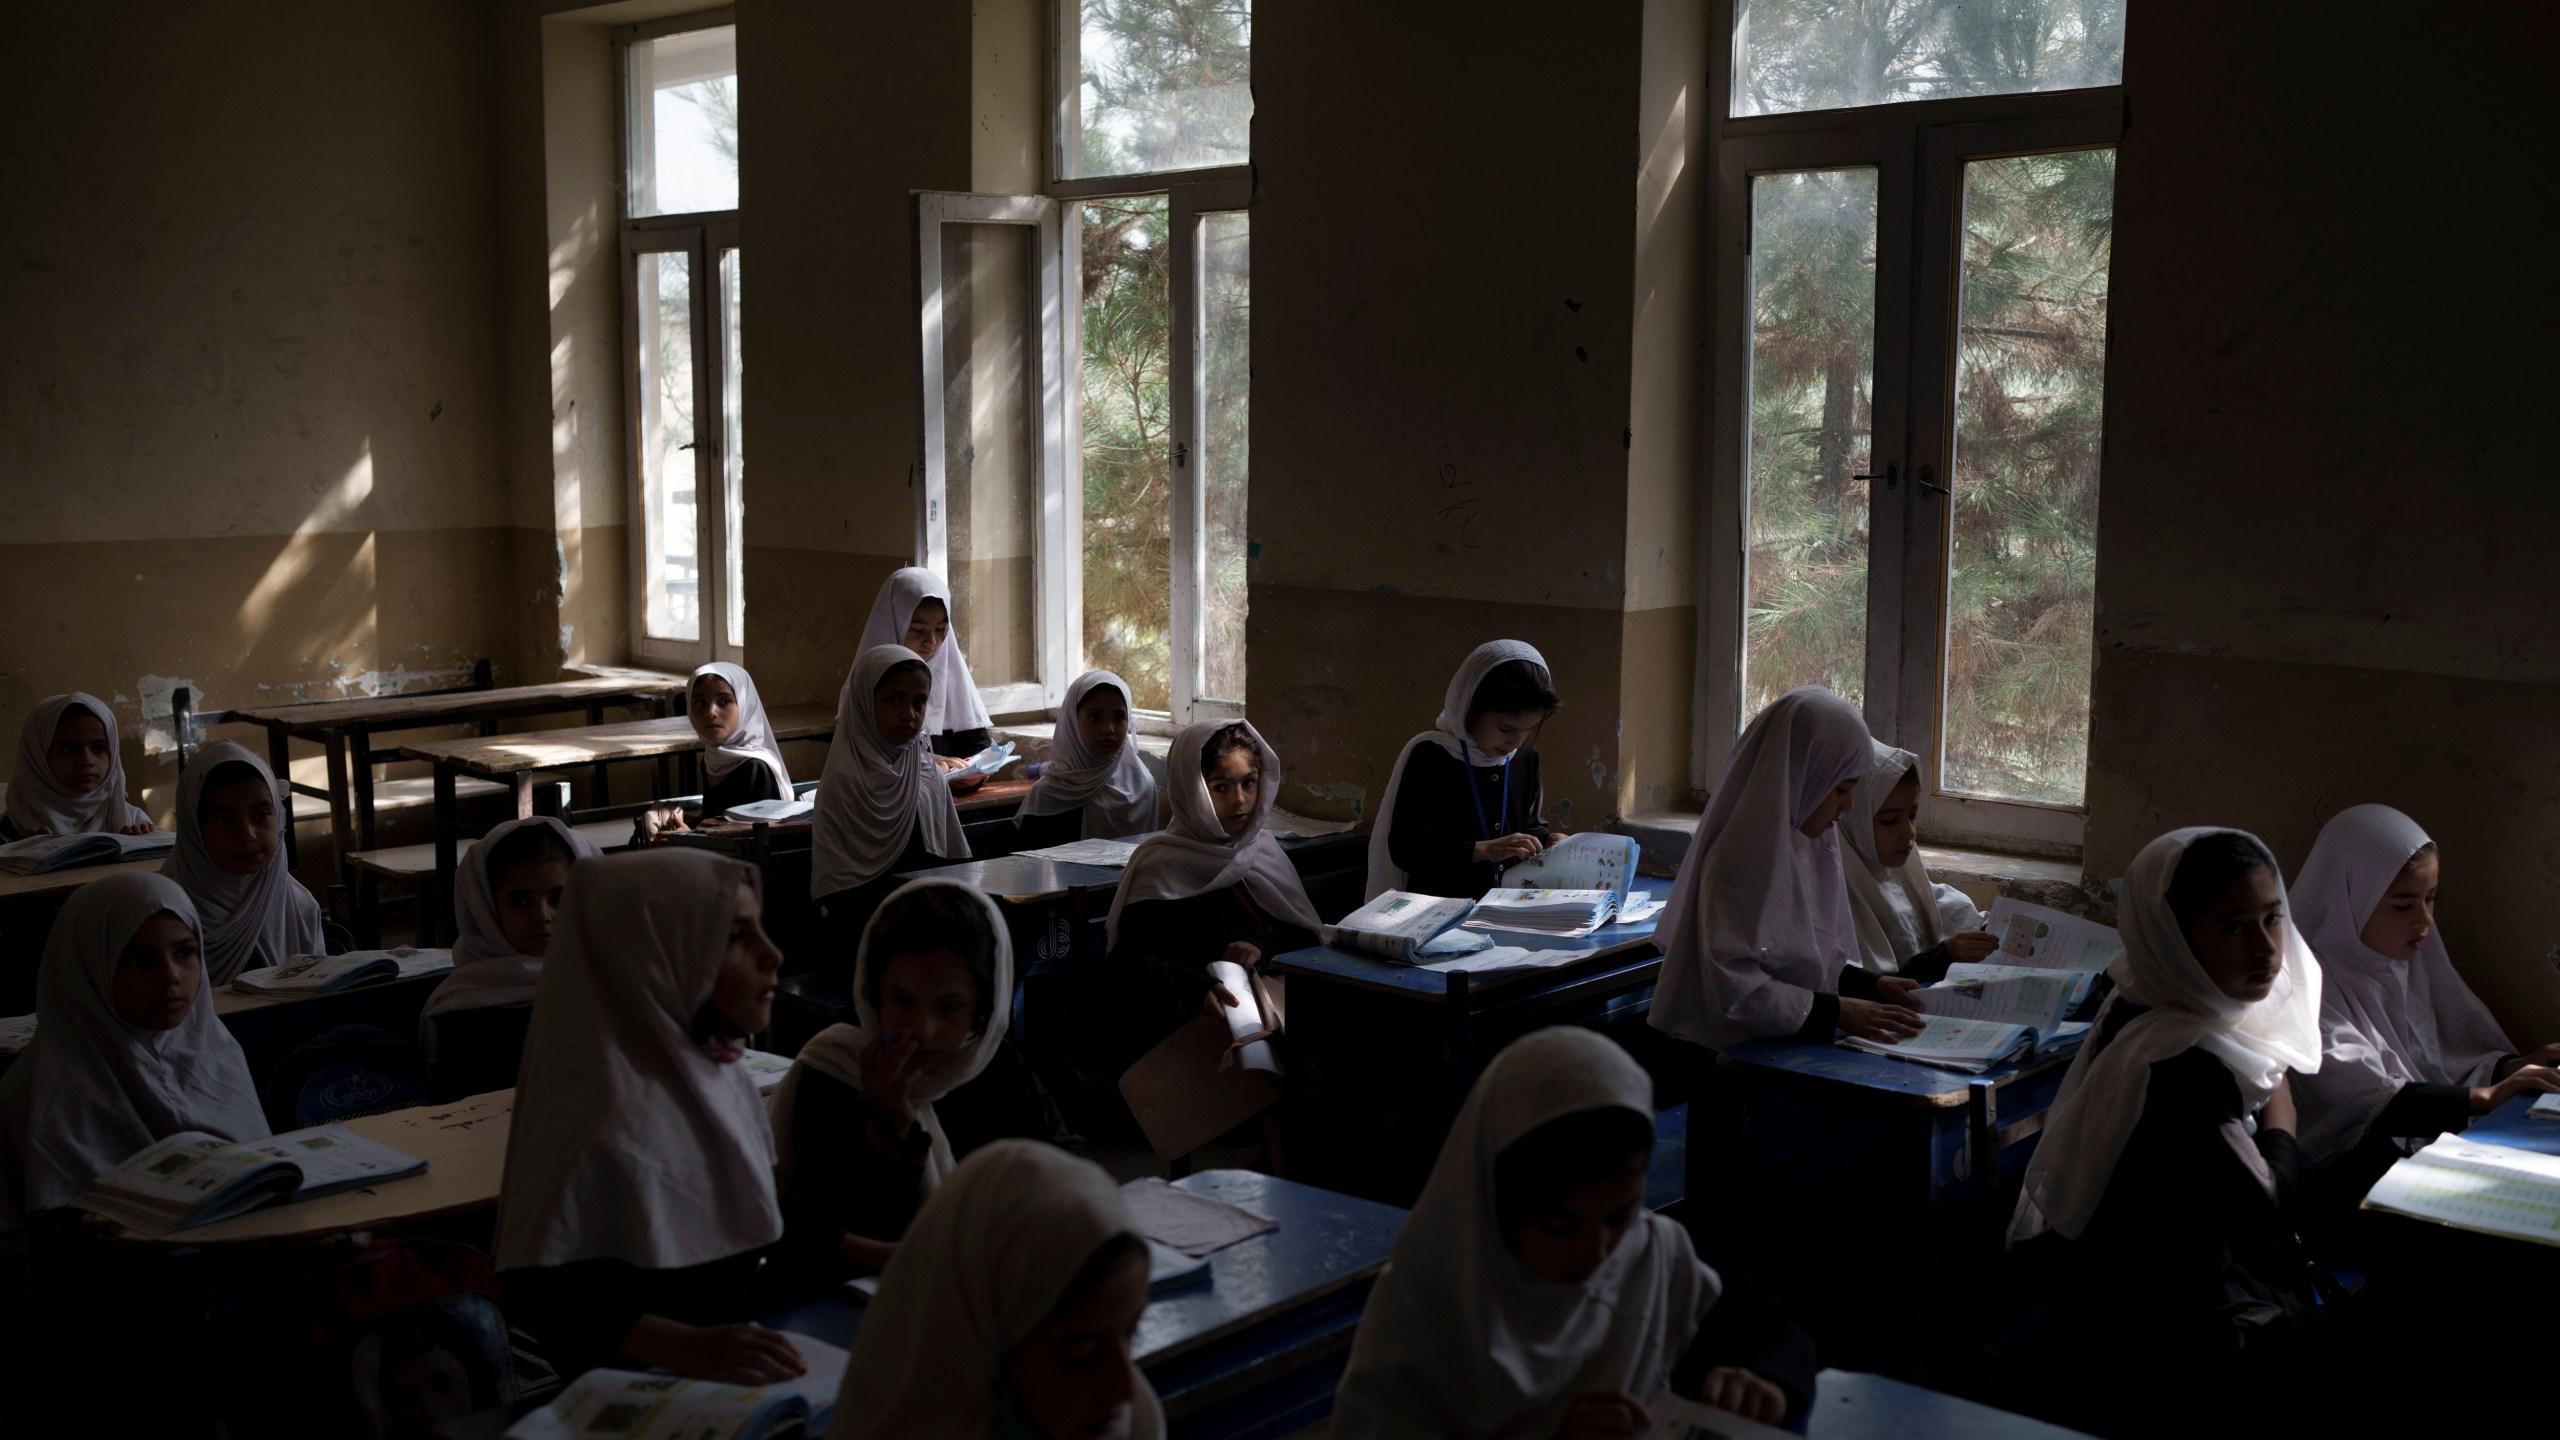 Girls prepare for class at a school in Kabul, Afghanistan, Sunday, Sept. 12, 2021. (AP Photo/Felipe Dana)Girls prepare for class at a school in Kabul, Afghanistan, Sunday, Sept. 12, 2021. (AP Photo/Felipe Dana)